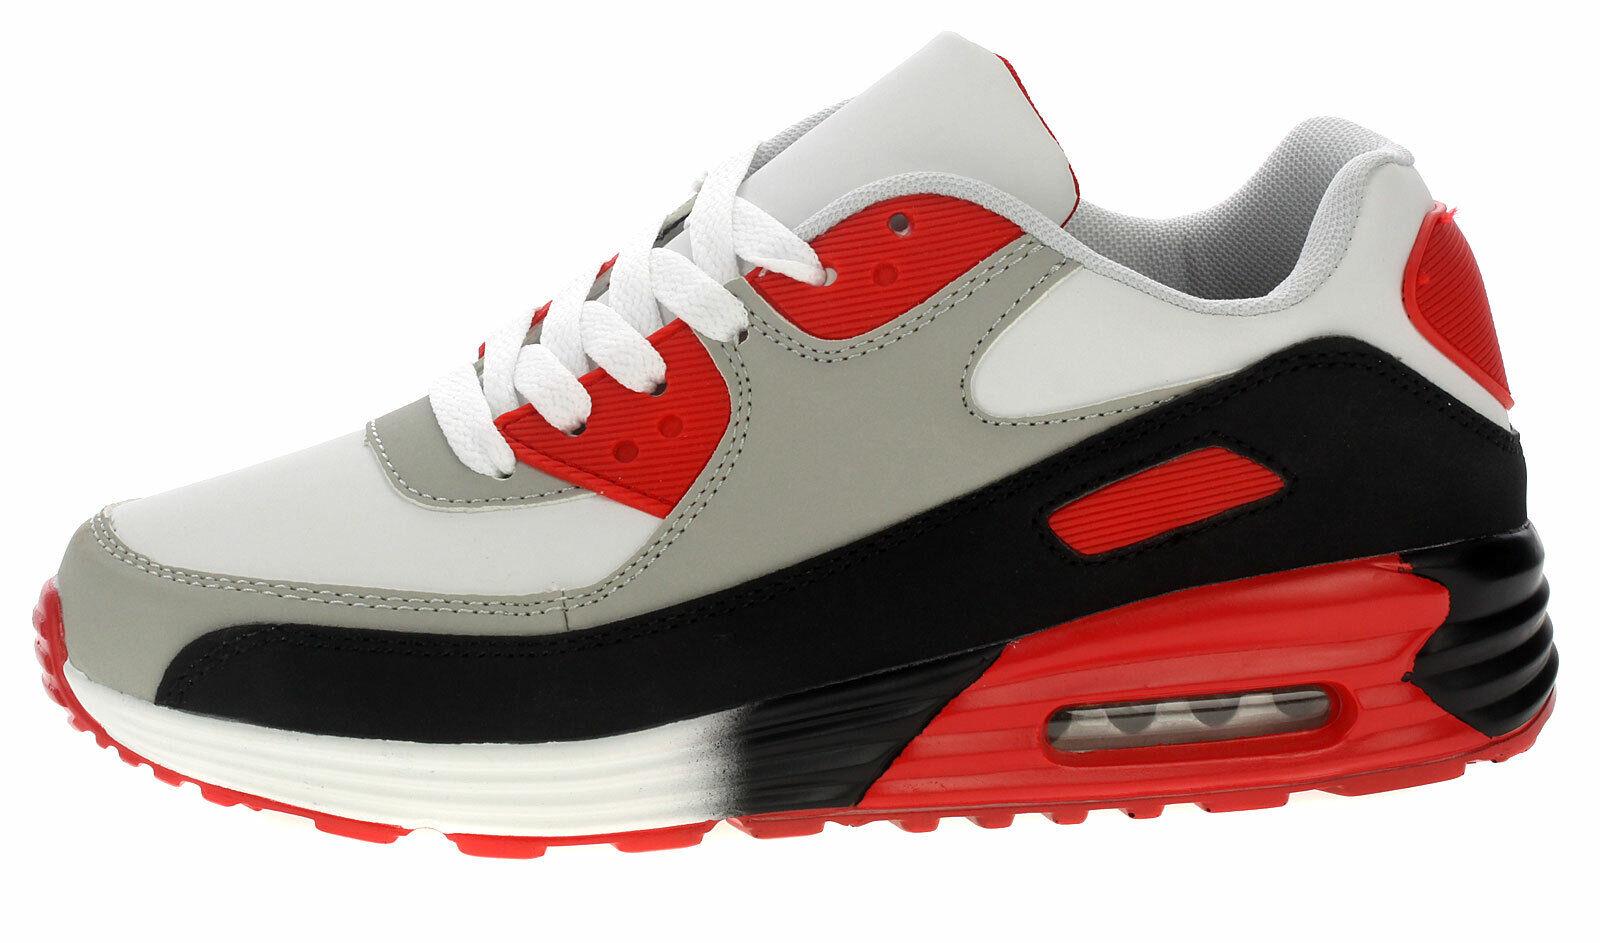 6. schwarz-grau-rot